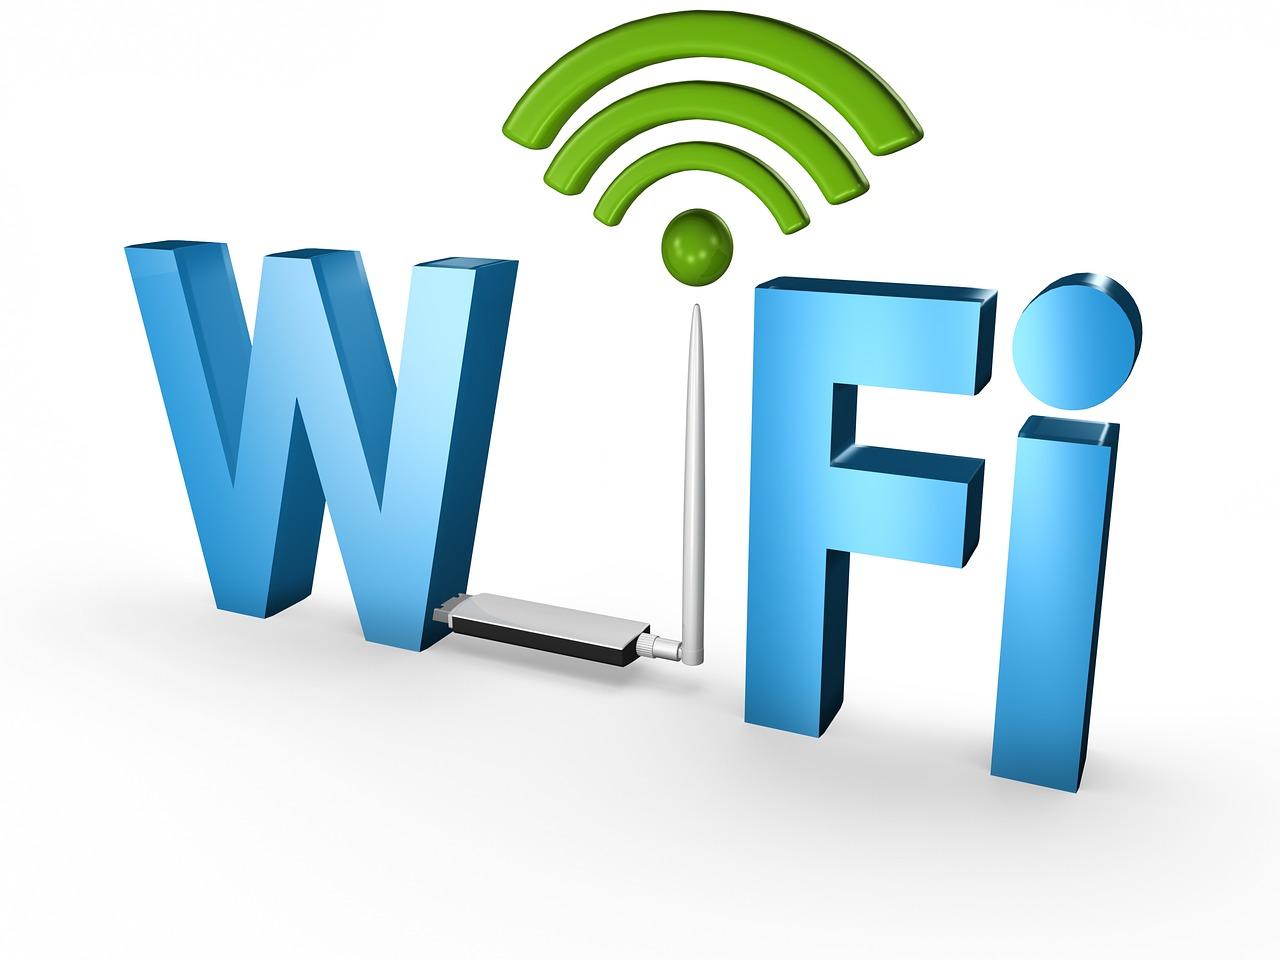 「au Wi-Fi SPOT」、auピタットプランでも無料化!